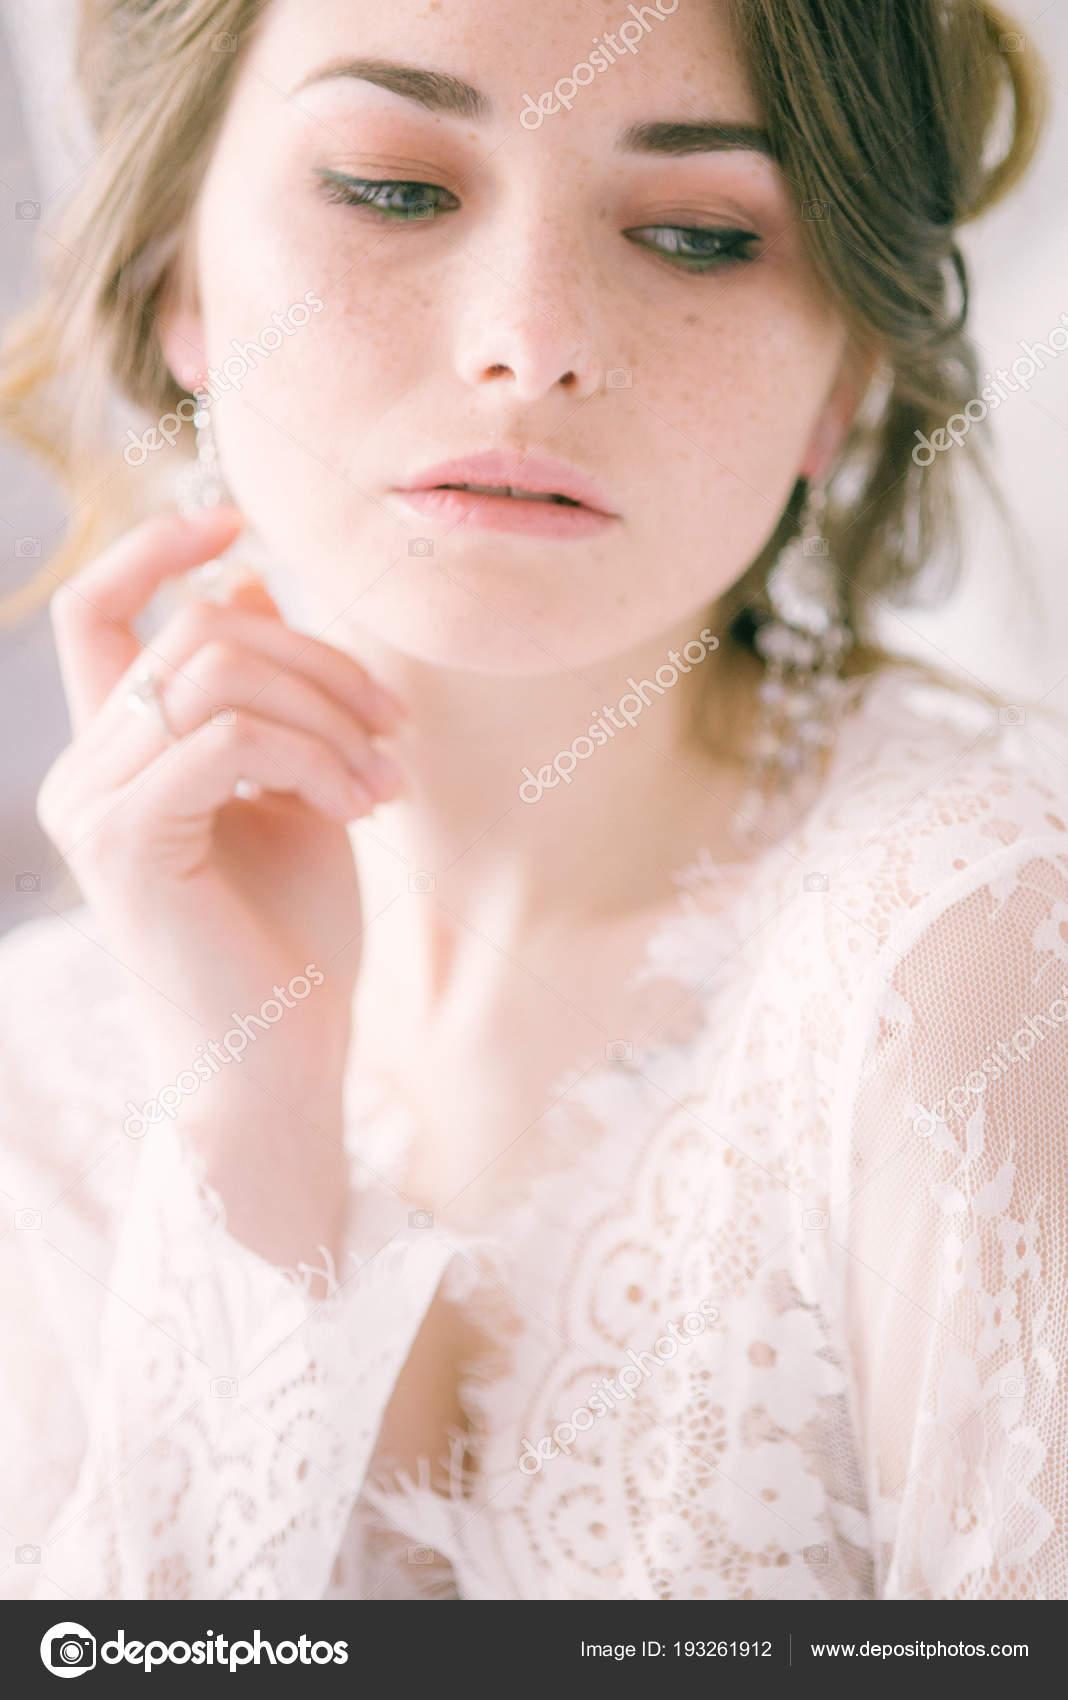 2f6a186bfca Πορτρέτο Του Όμορφη Νύφη Πρωί Της Νύφης Πρωί Του Γάμου — Φωτογραφία ...